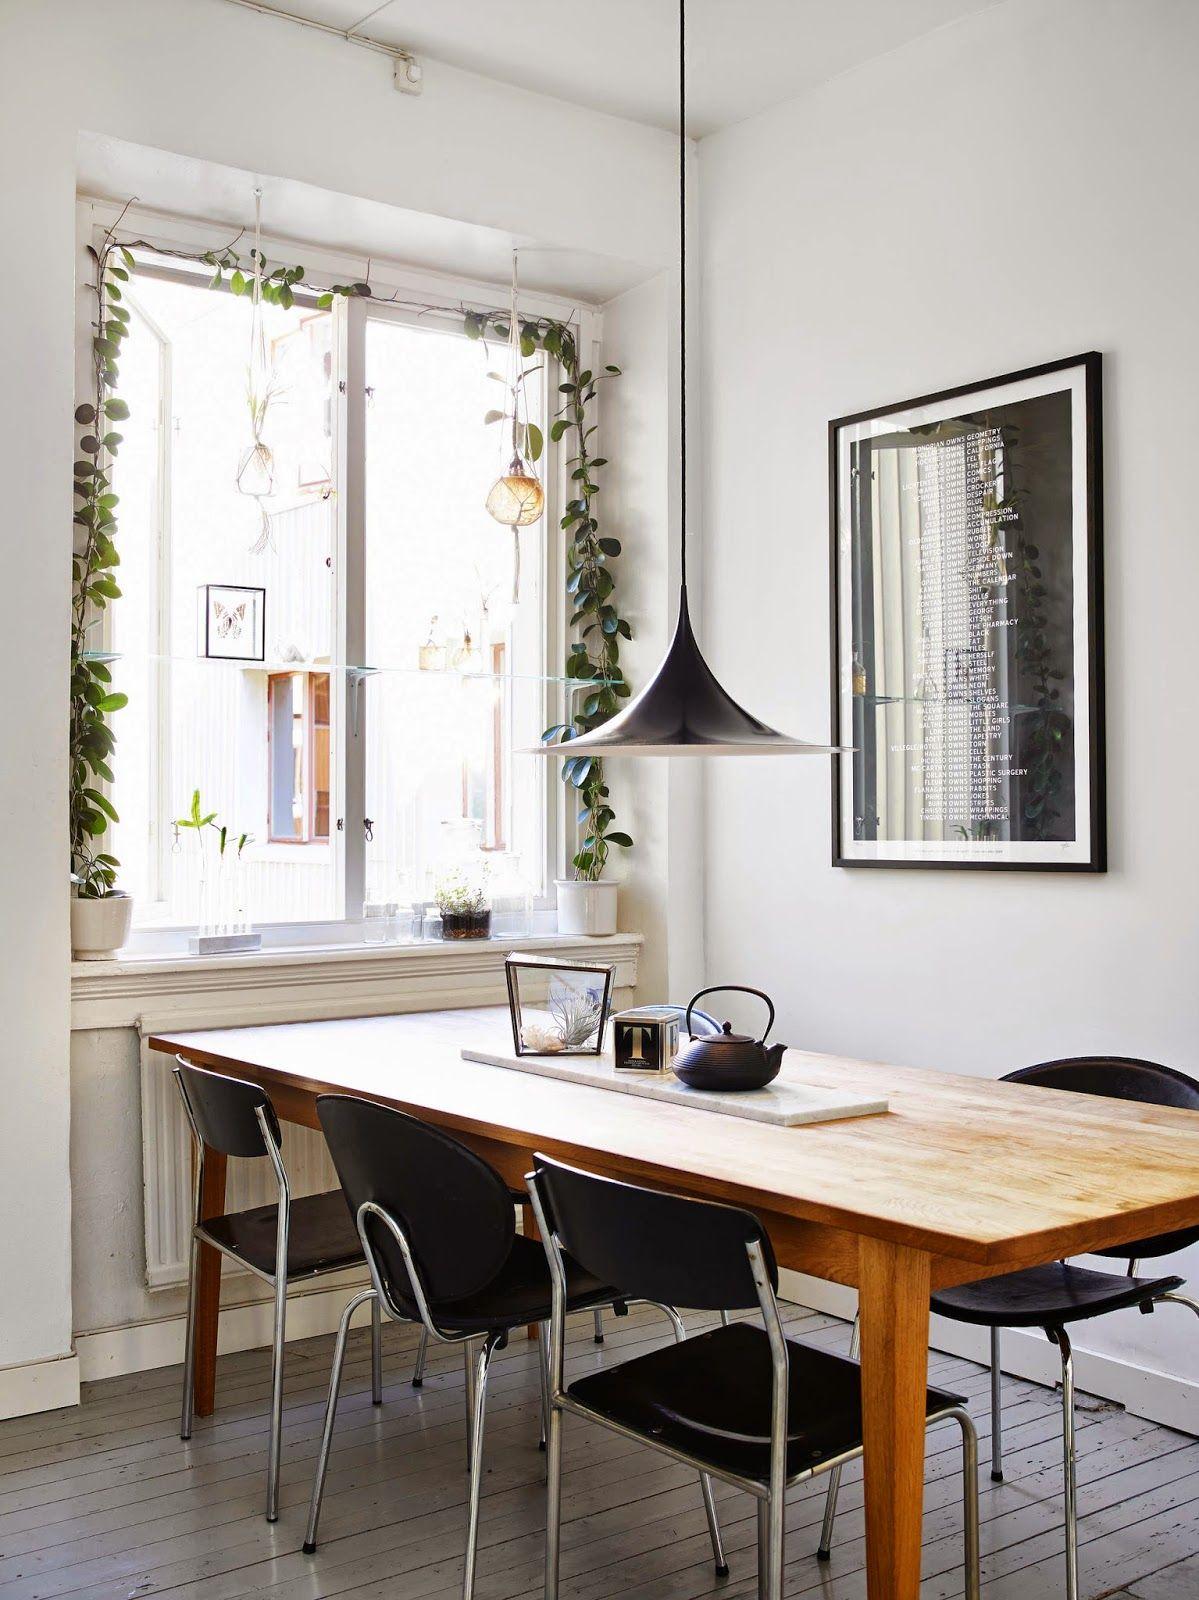 Foto My Scandinavian Home Living Room And Dining Room Design My Scandinavian Home Dining Room Design